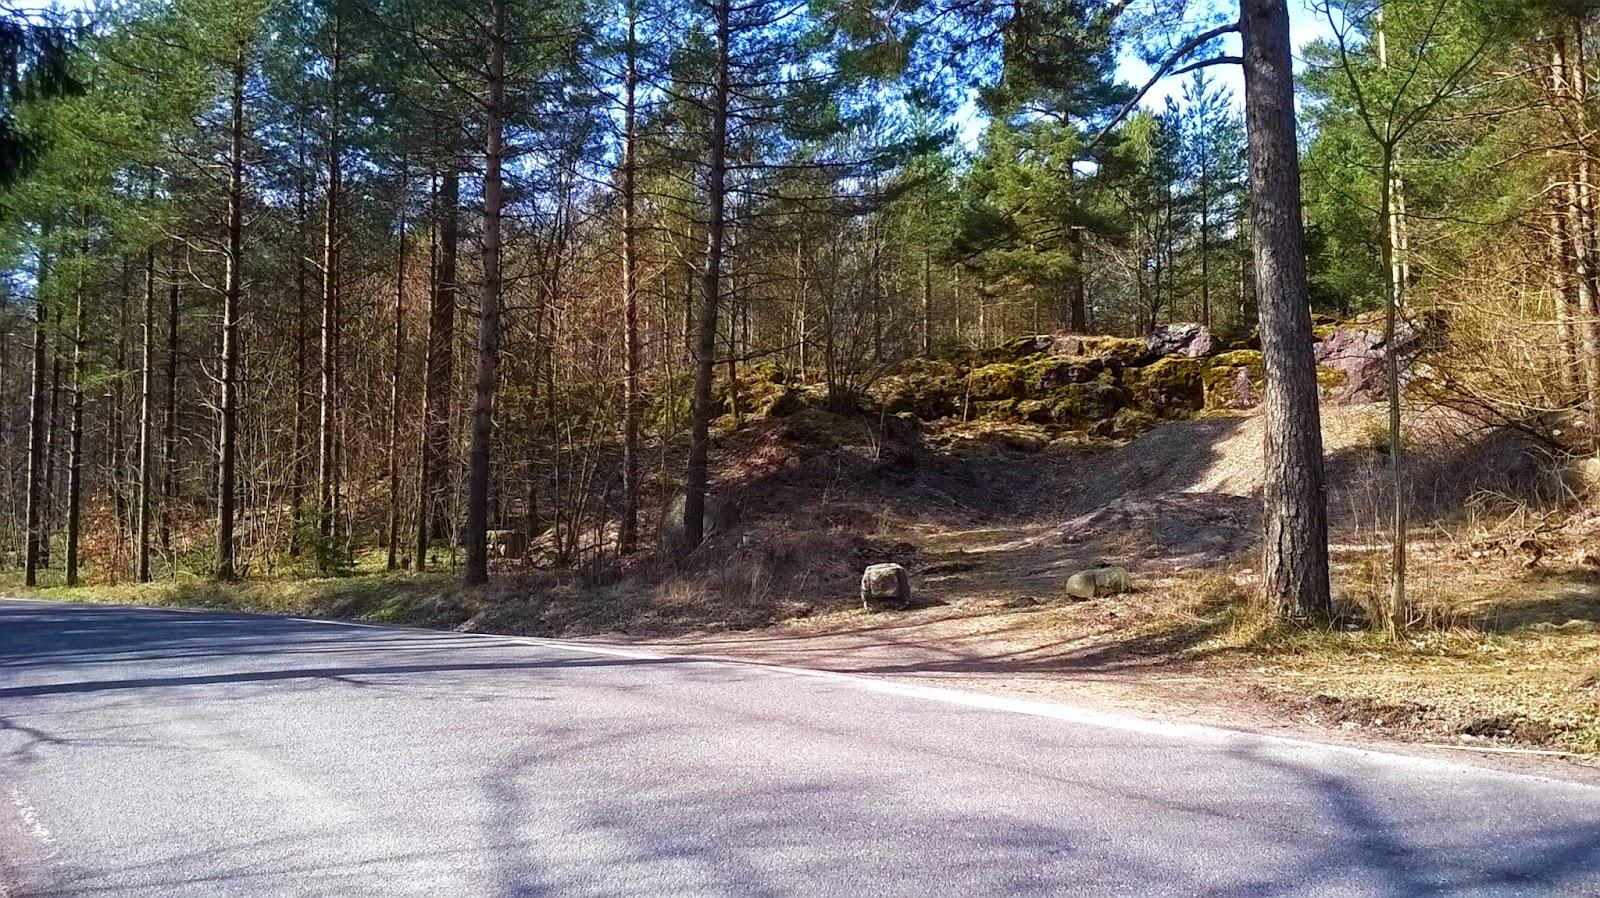 norwegia i leśny zakątek